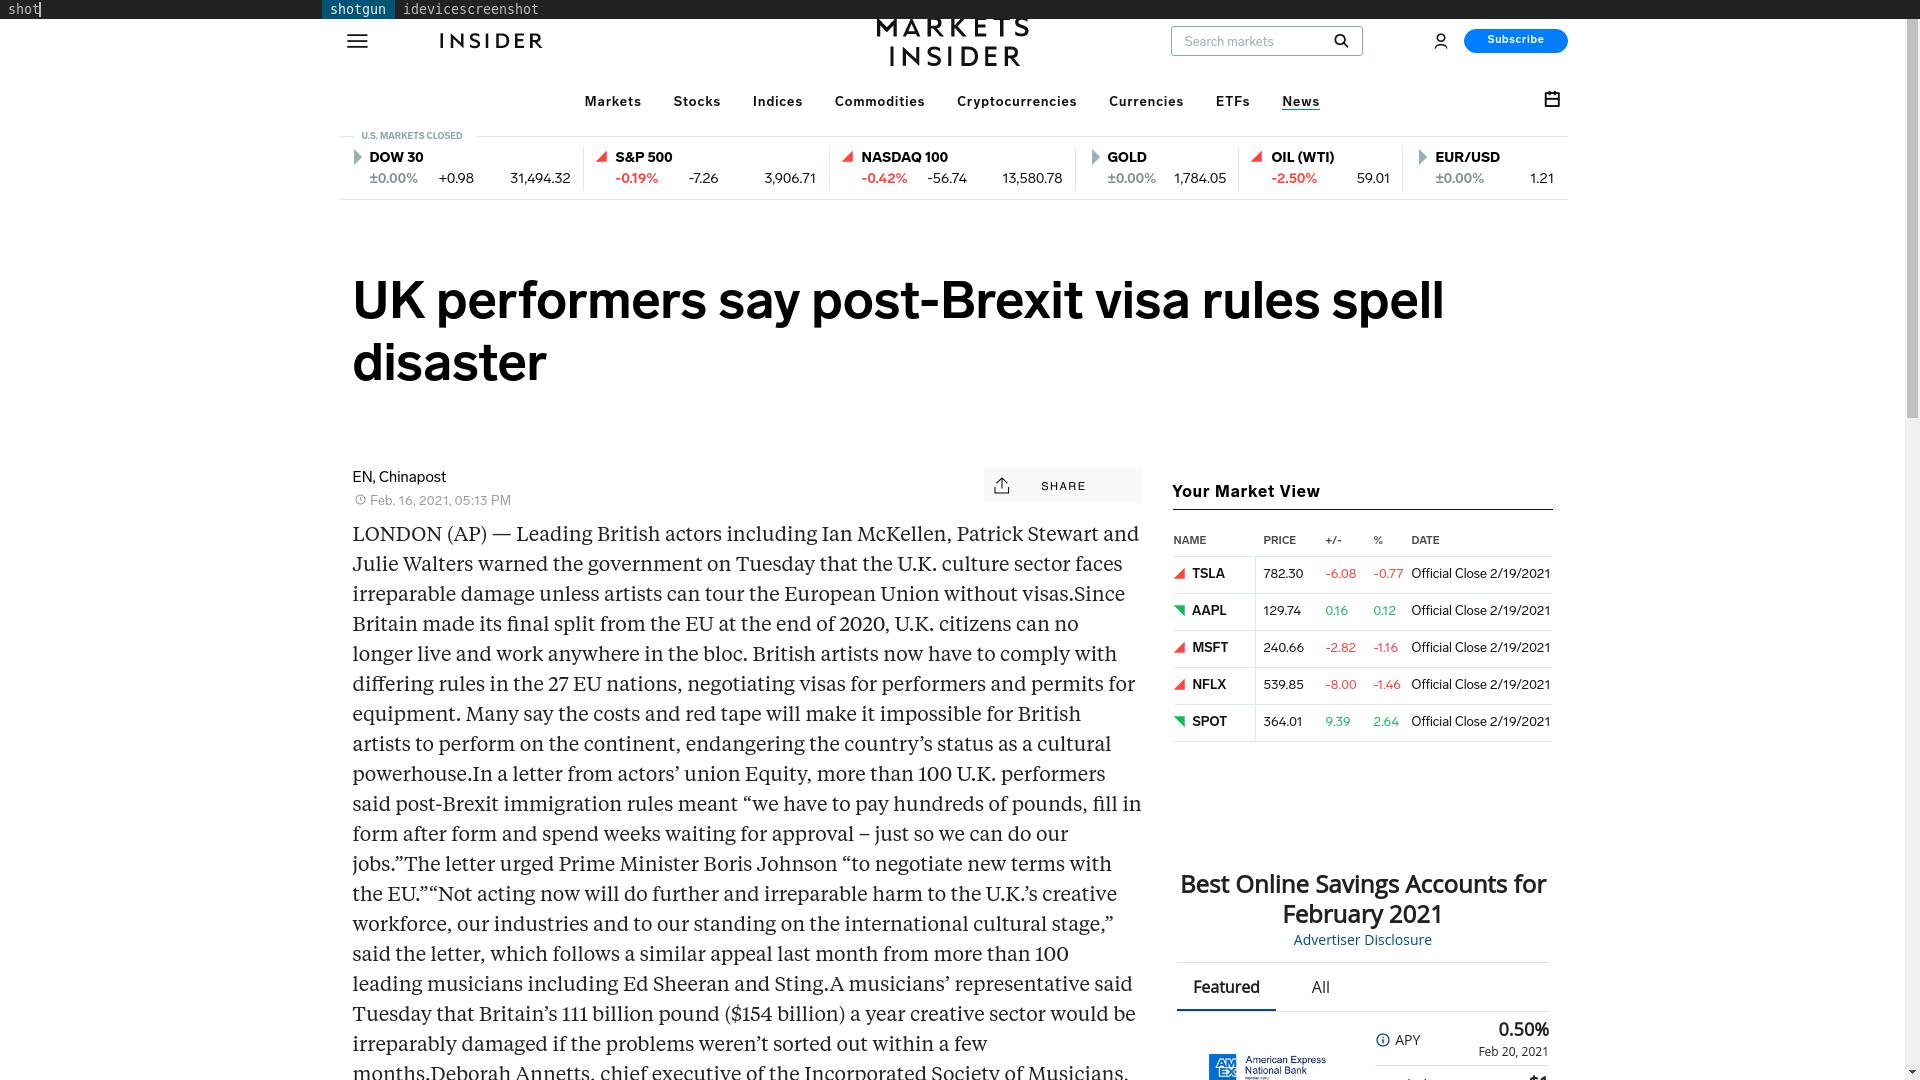 Fairness Rocks News UK performers say post-Brexit visa rules spell disaster